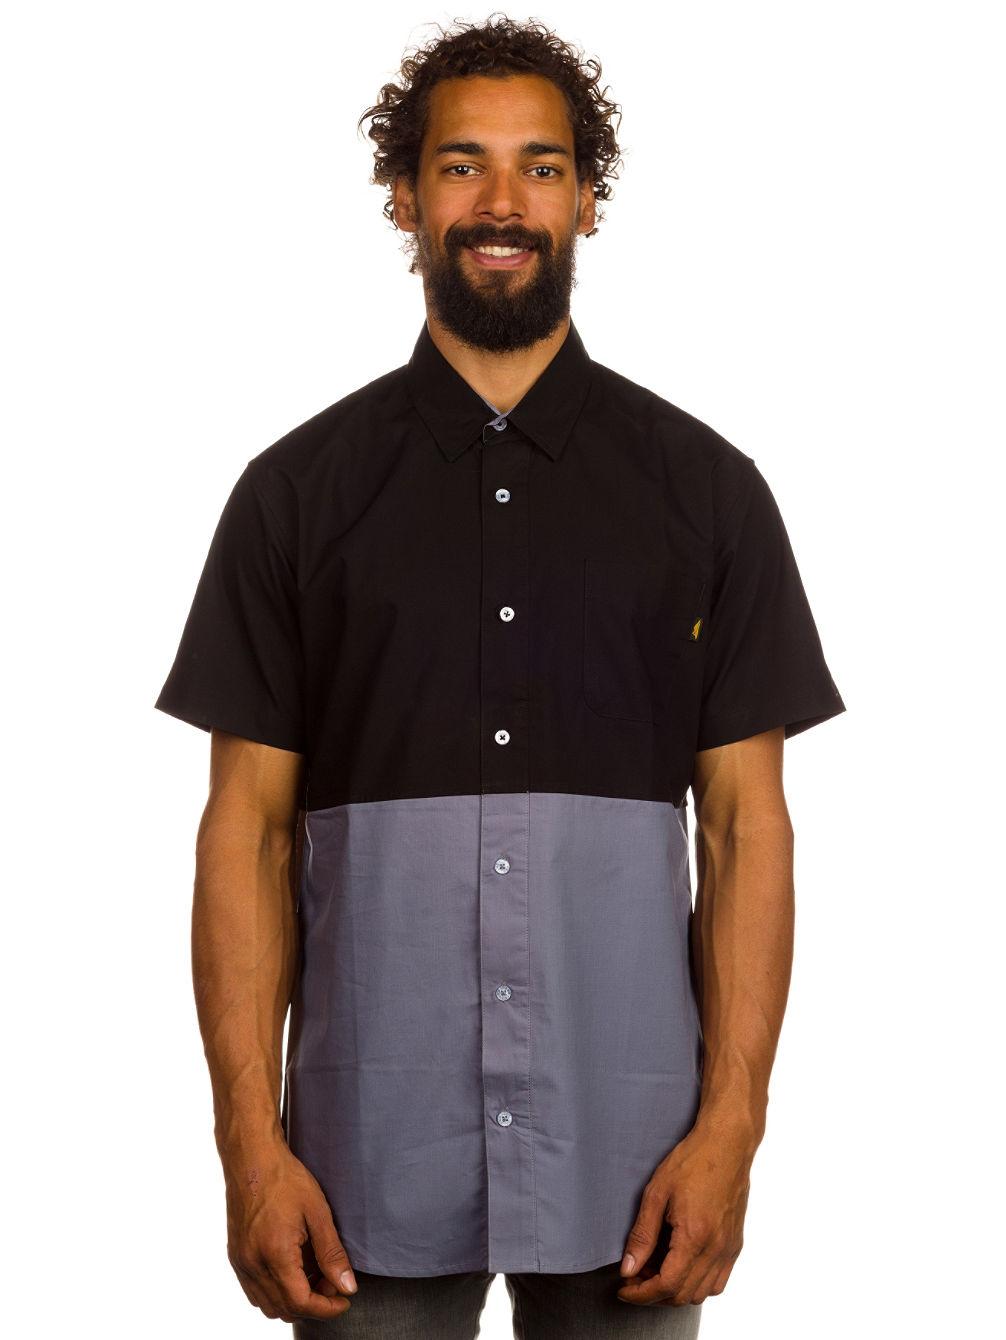 benny-gold-retreat-2-tone-button-down-shirt